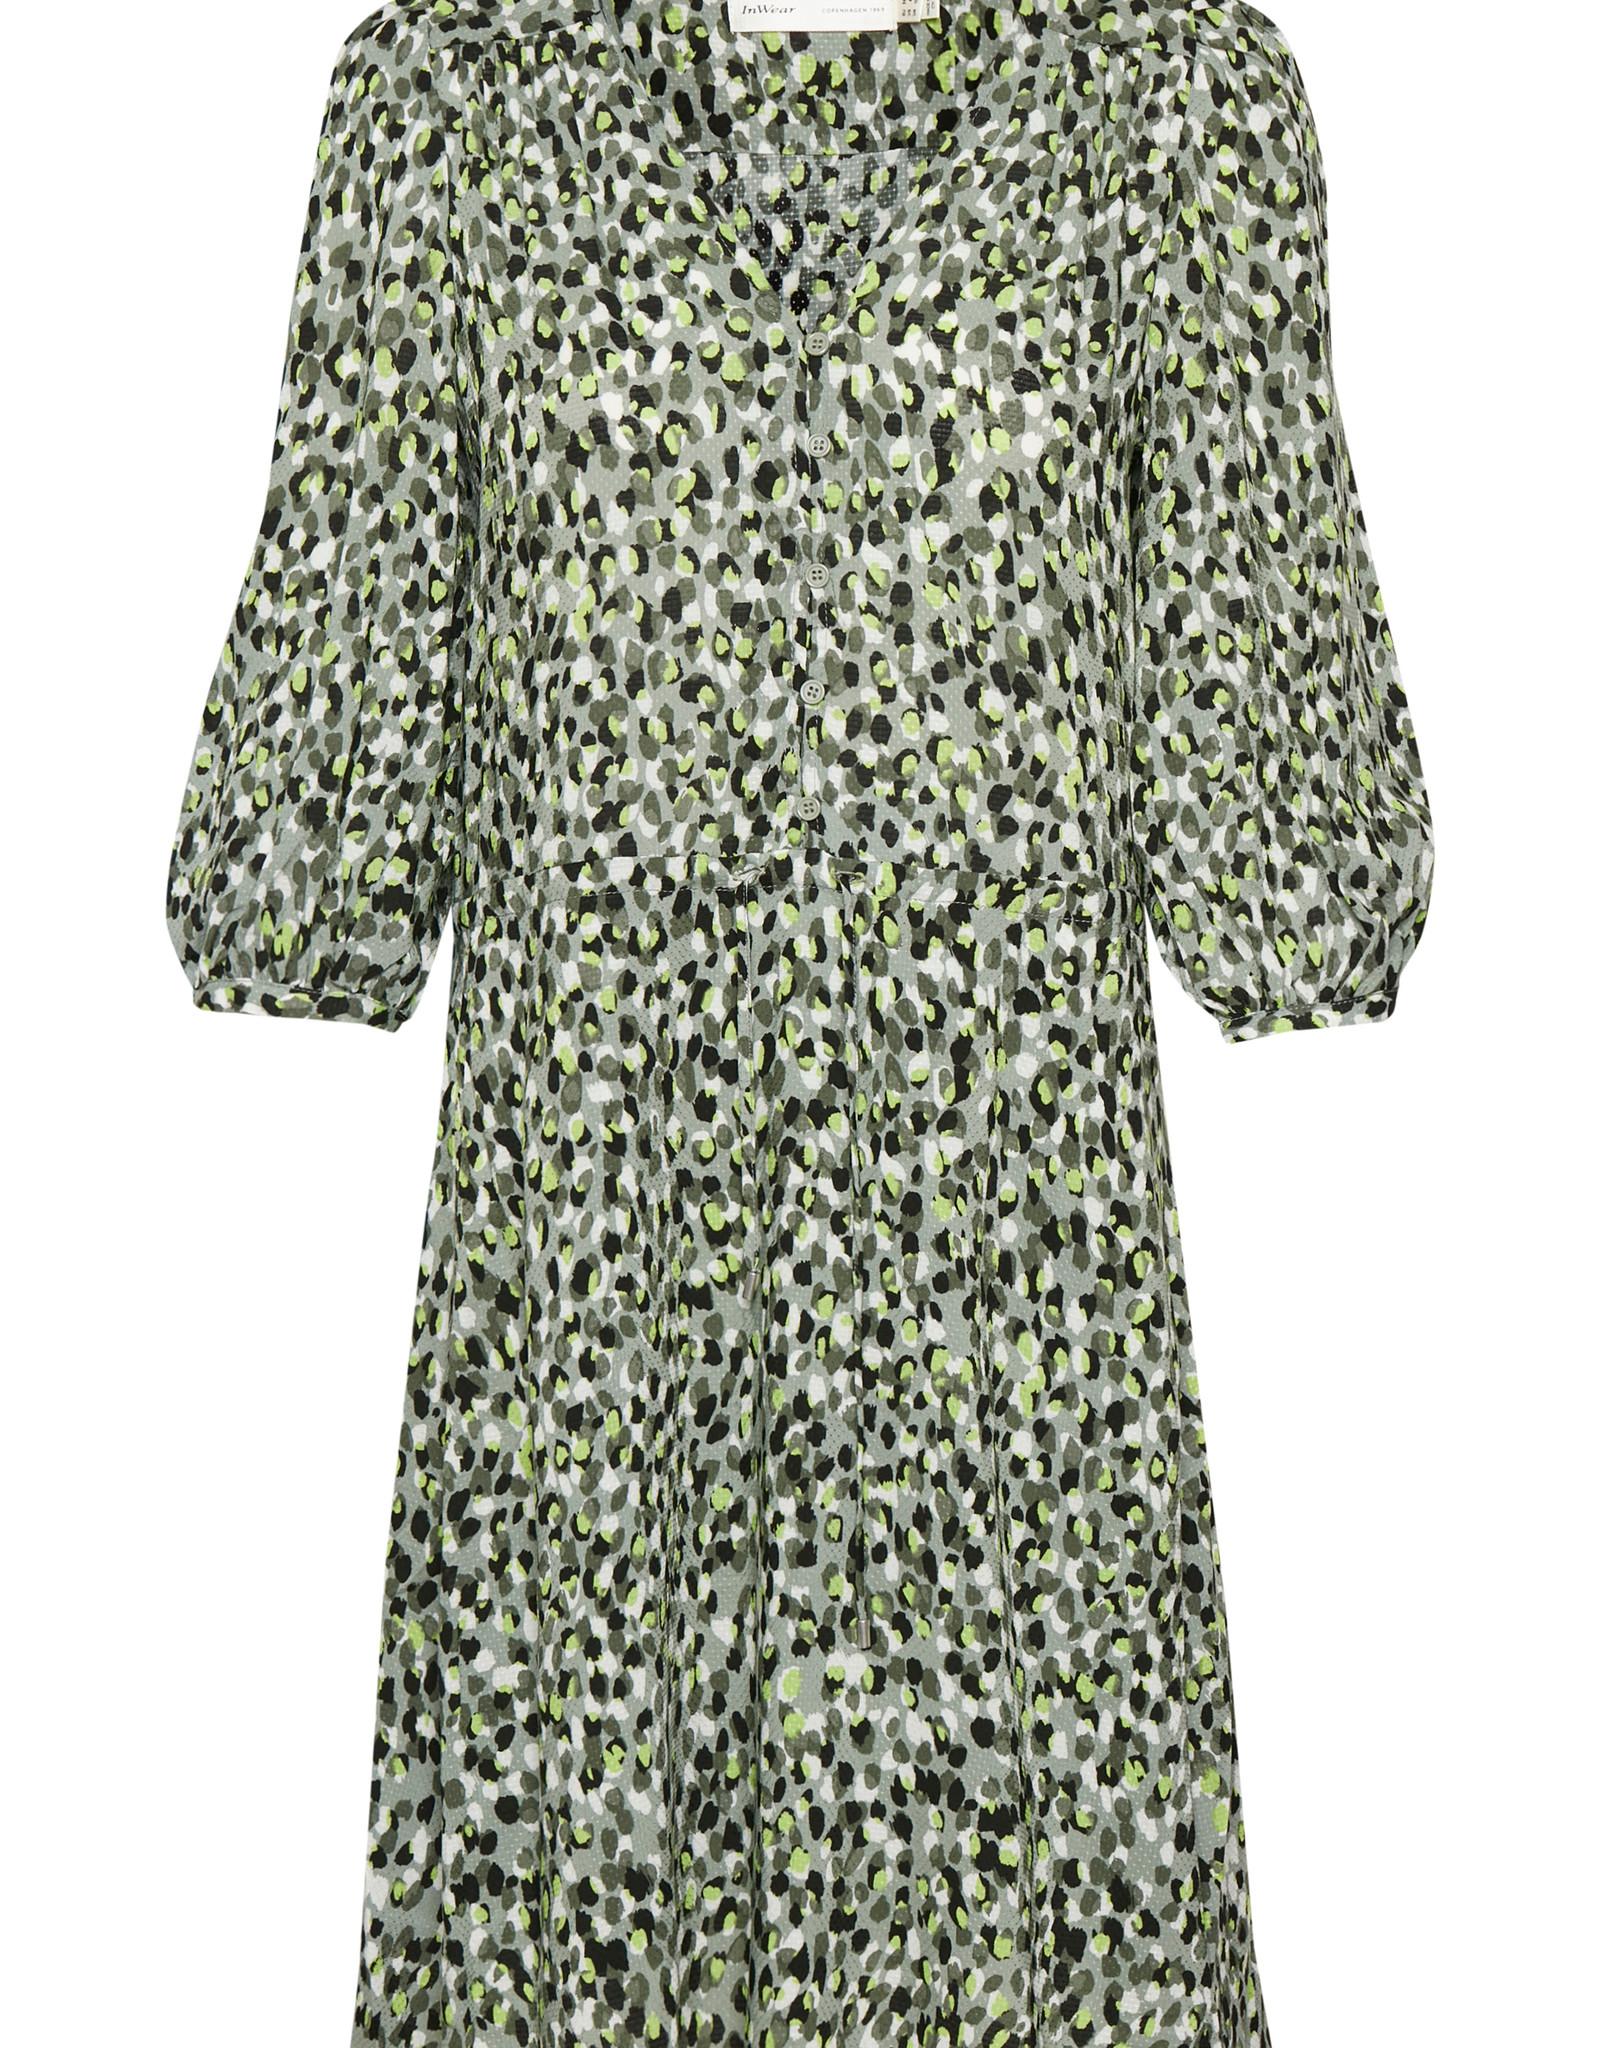 InWear Fia Dress Green Forrest Confetti